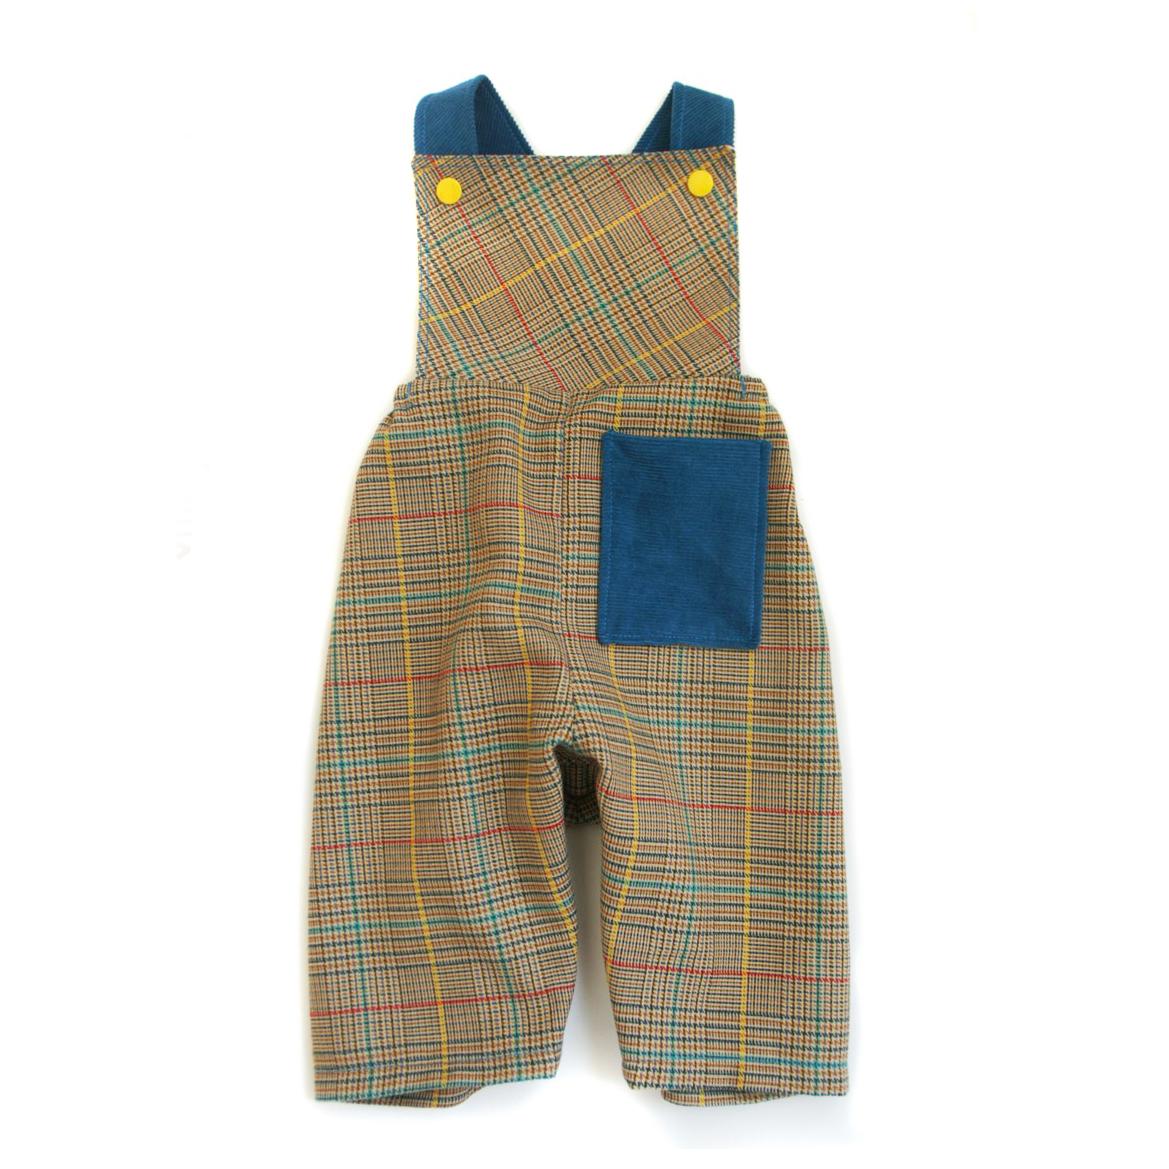 Vintage Romper Suspender Style Overalls For Baby Felt